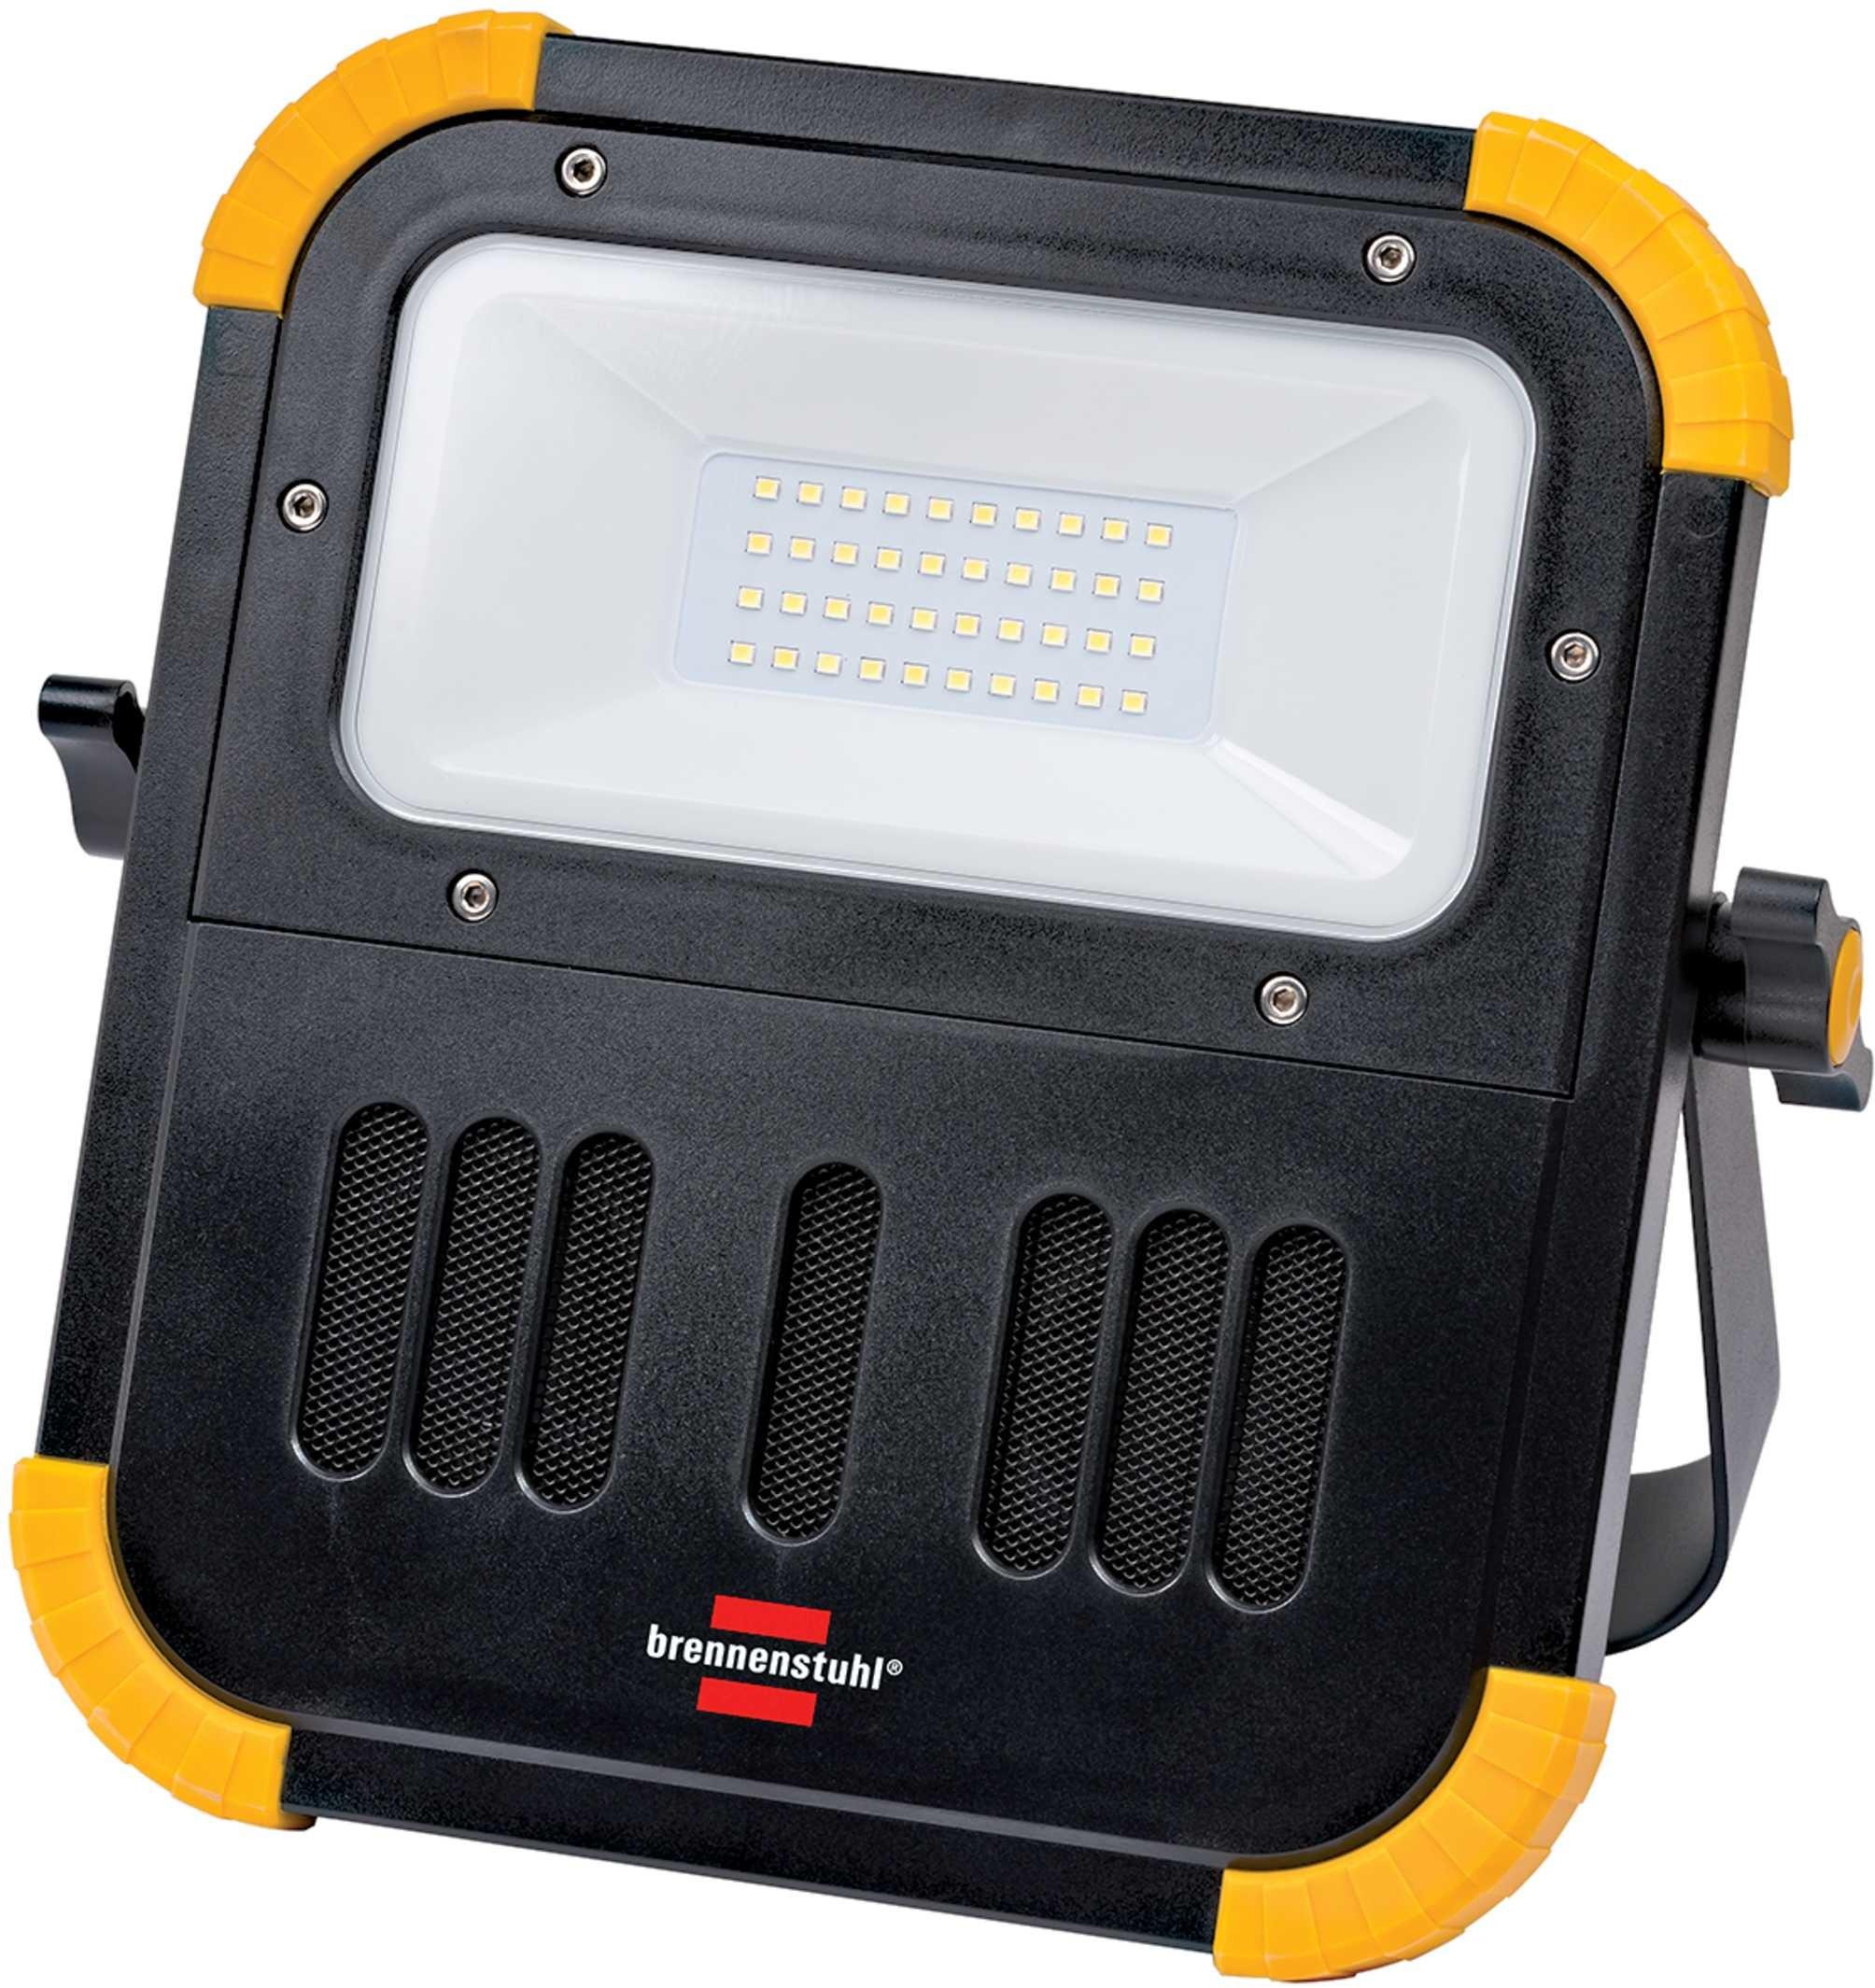 Brennenstuhl lampa naświetlacz z głośnikami bluetooth akumulatorowa blumo 1171620